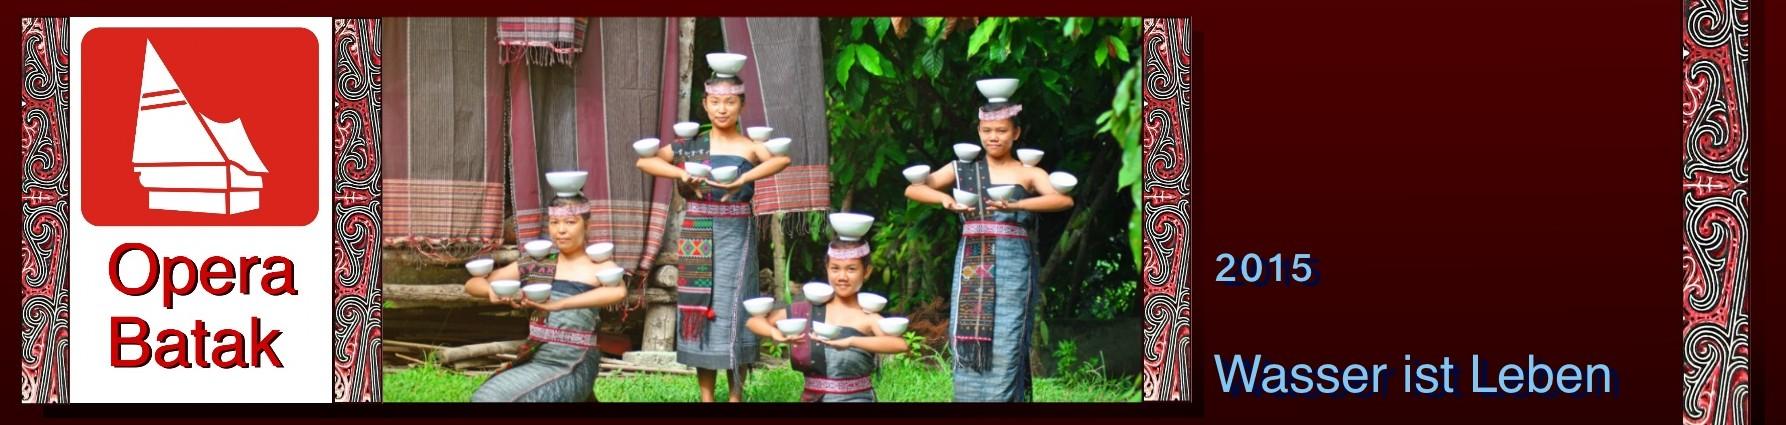 Opera Batak 2015 – Frauen am Rande des Sees